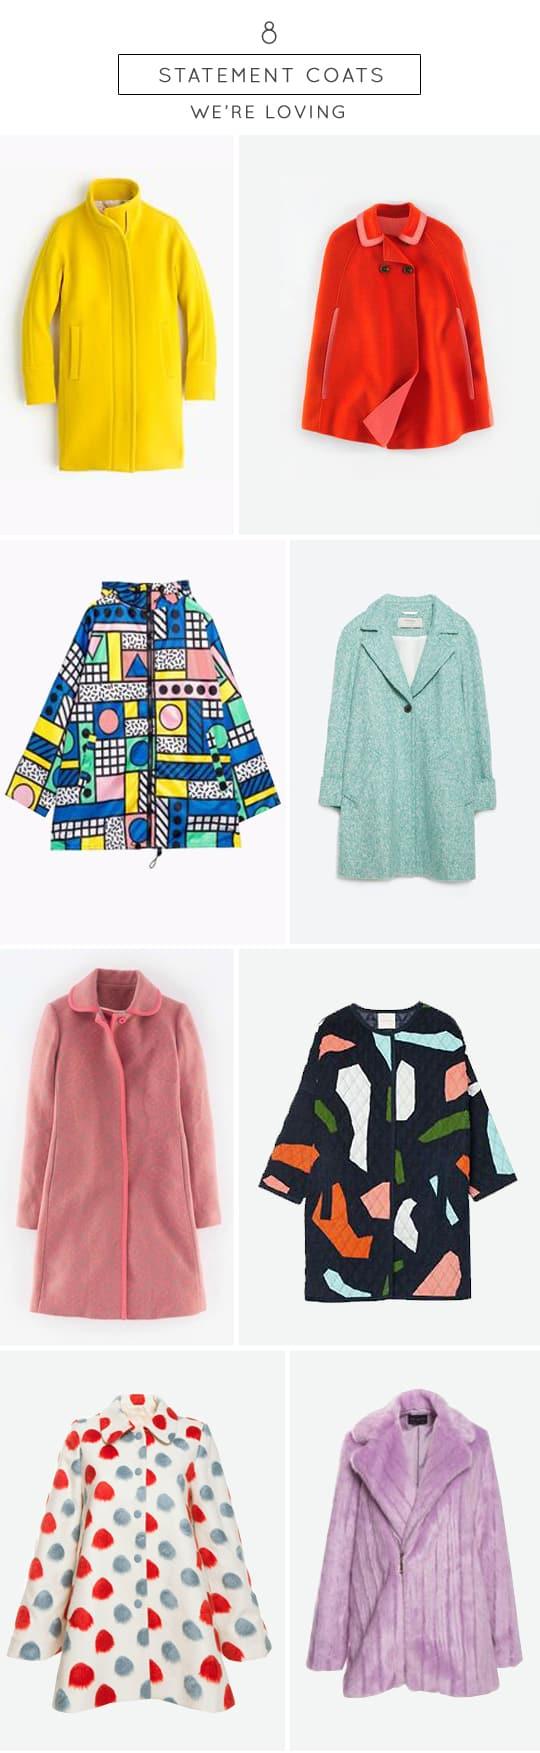 8 statement coats we're loving